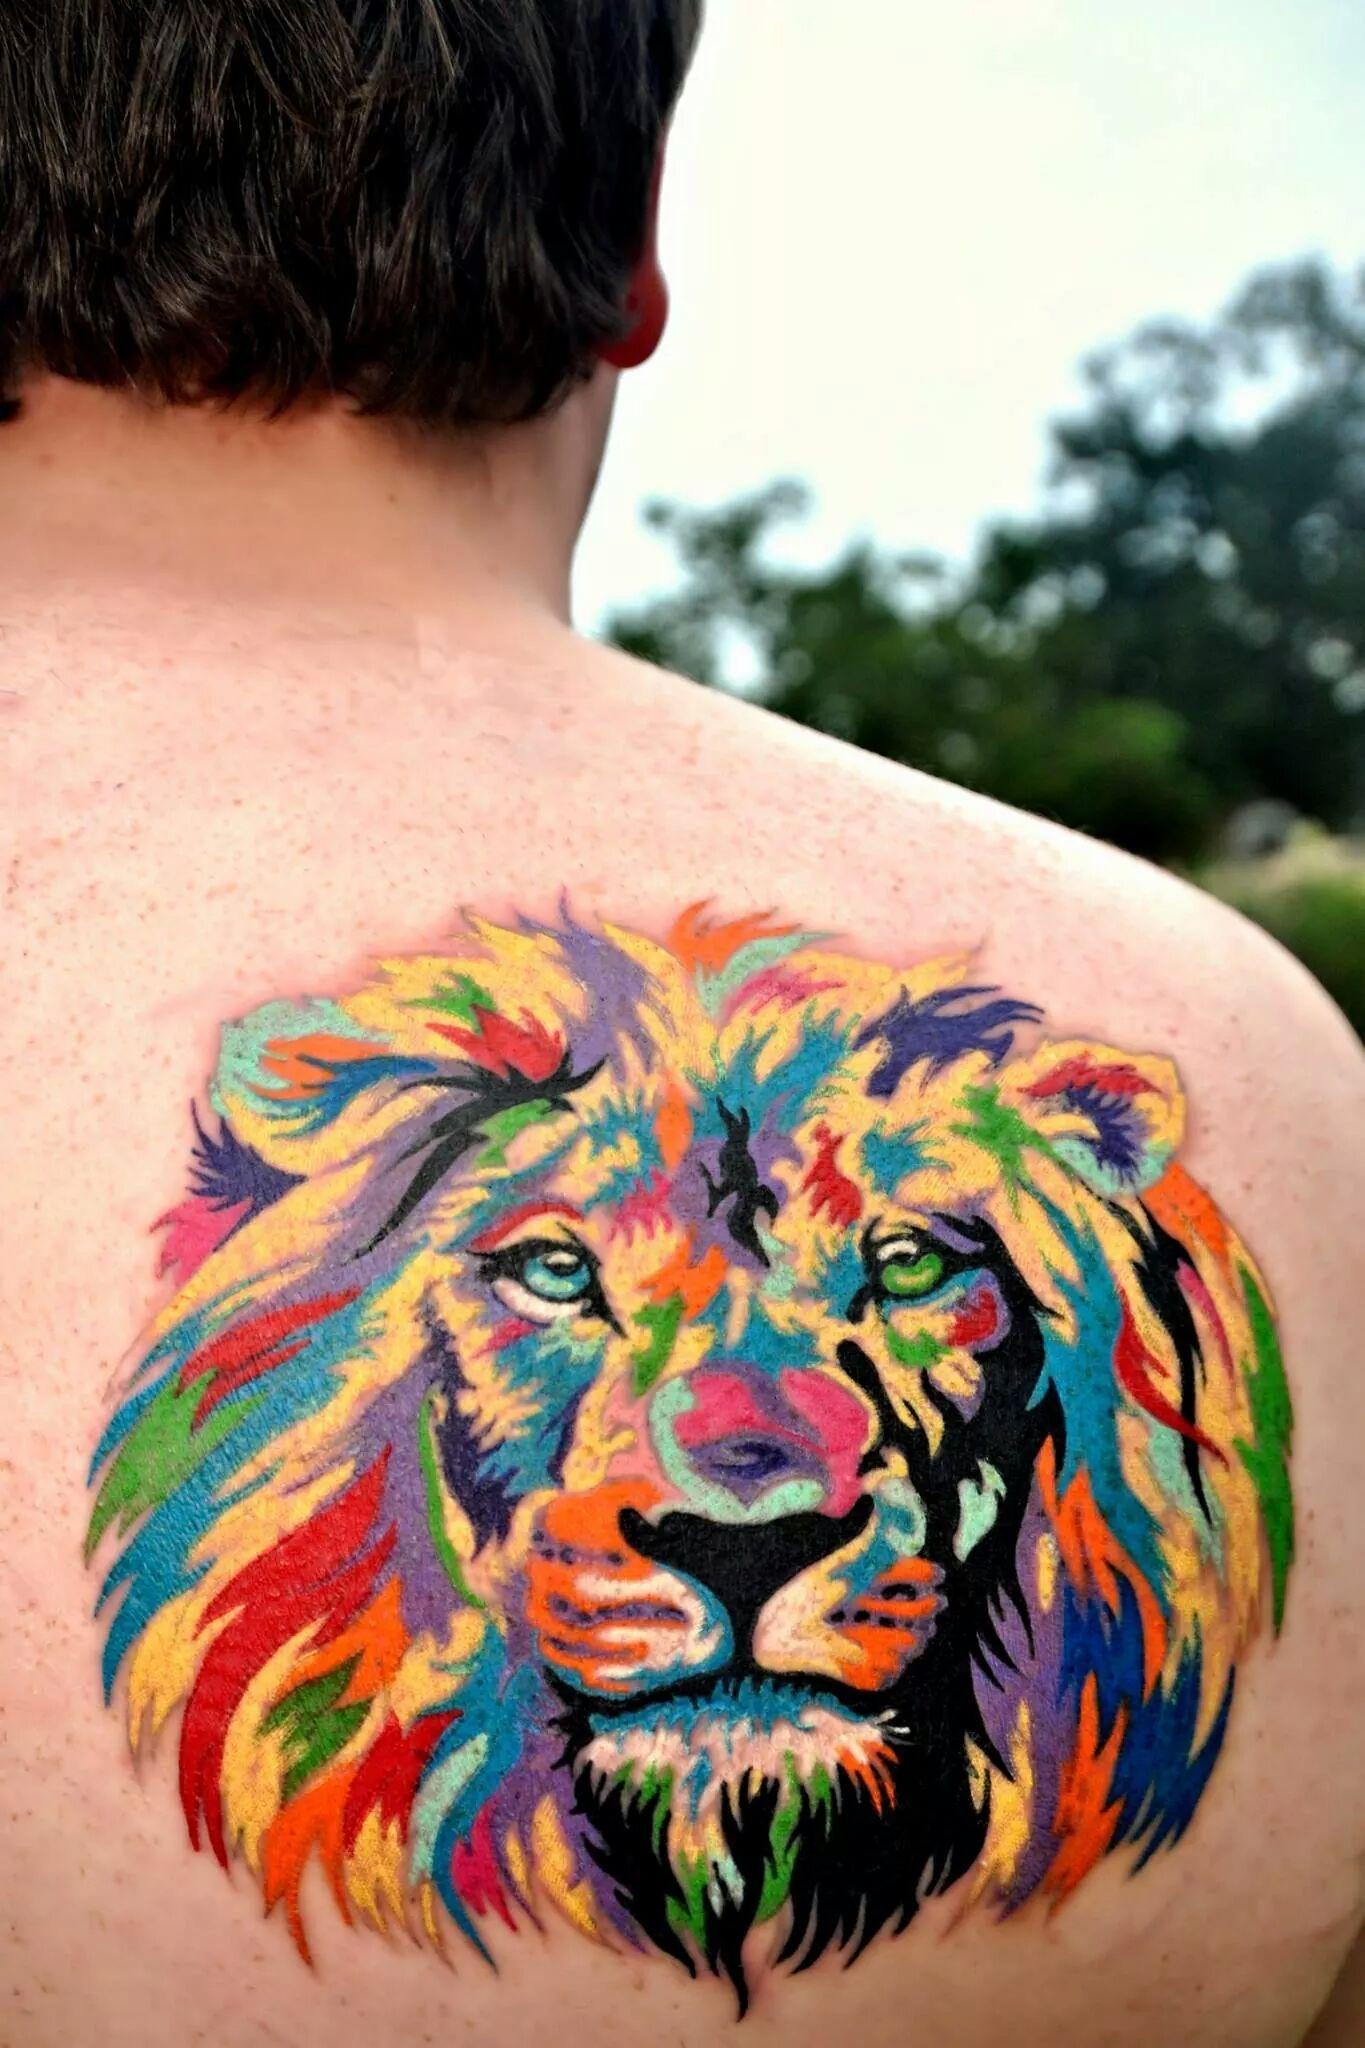 My vibrant lion tattoo done by zulu tattoo in austin tx for Great falls tattoo shops